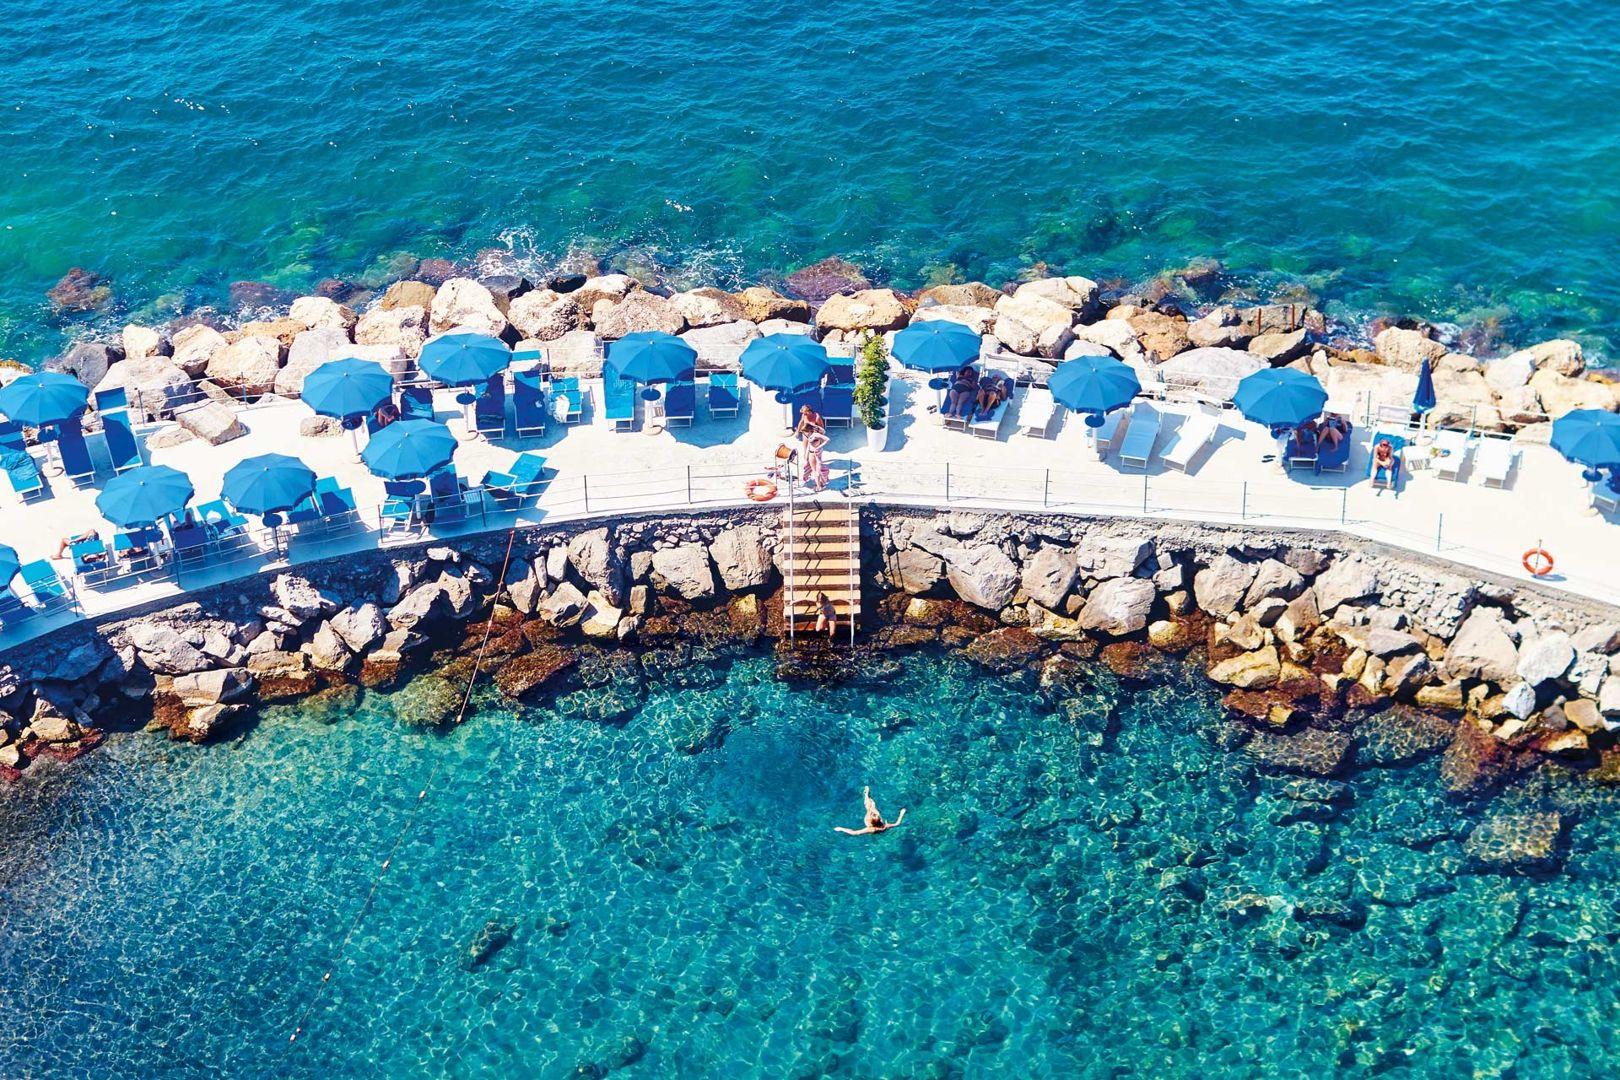 swimming-deck-at-parco-dei-principi-sorrento-italy-conde-nast-traveller-4may17-david-loftus_